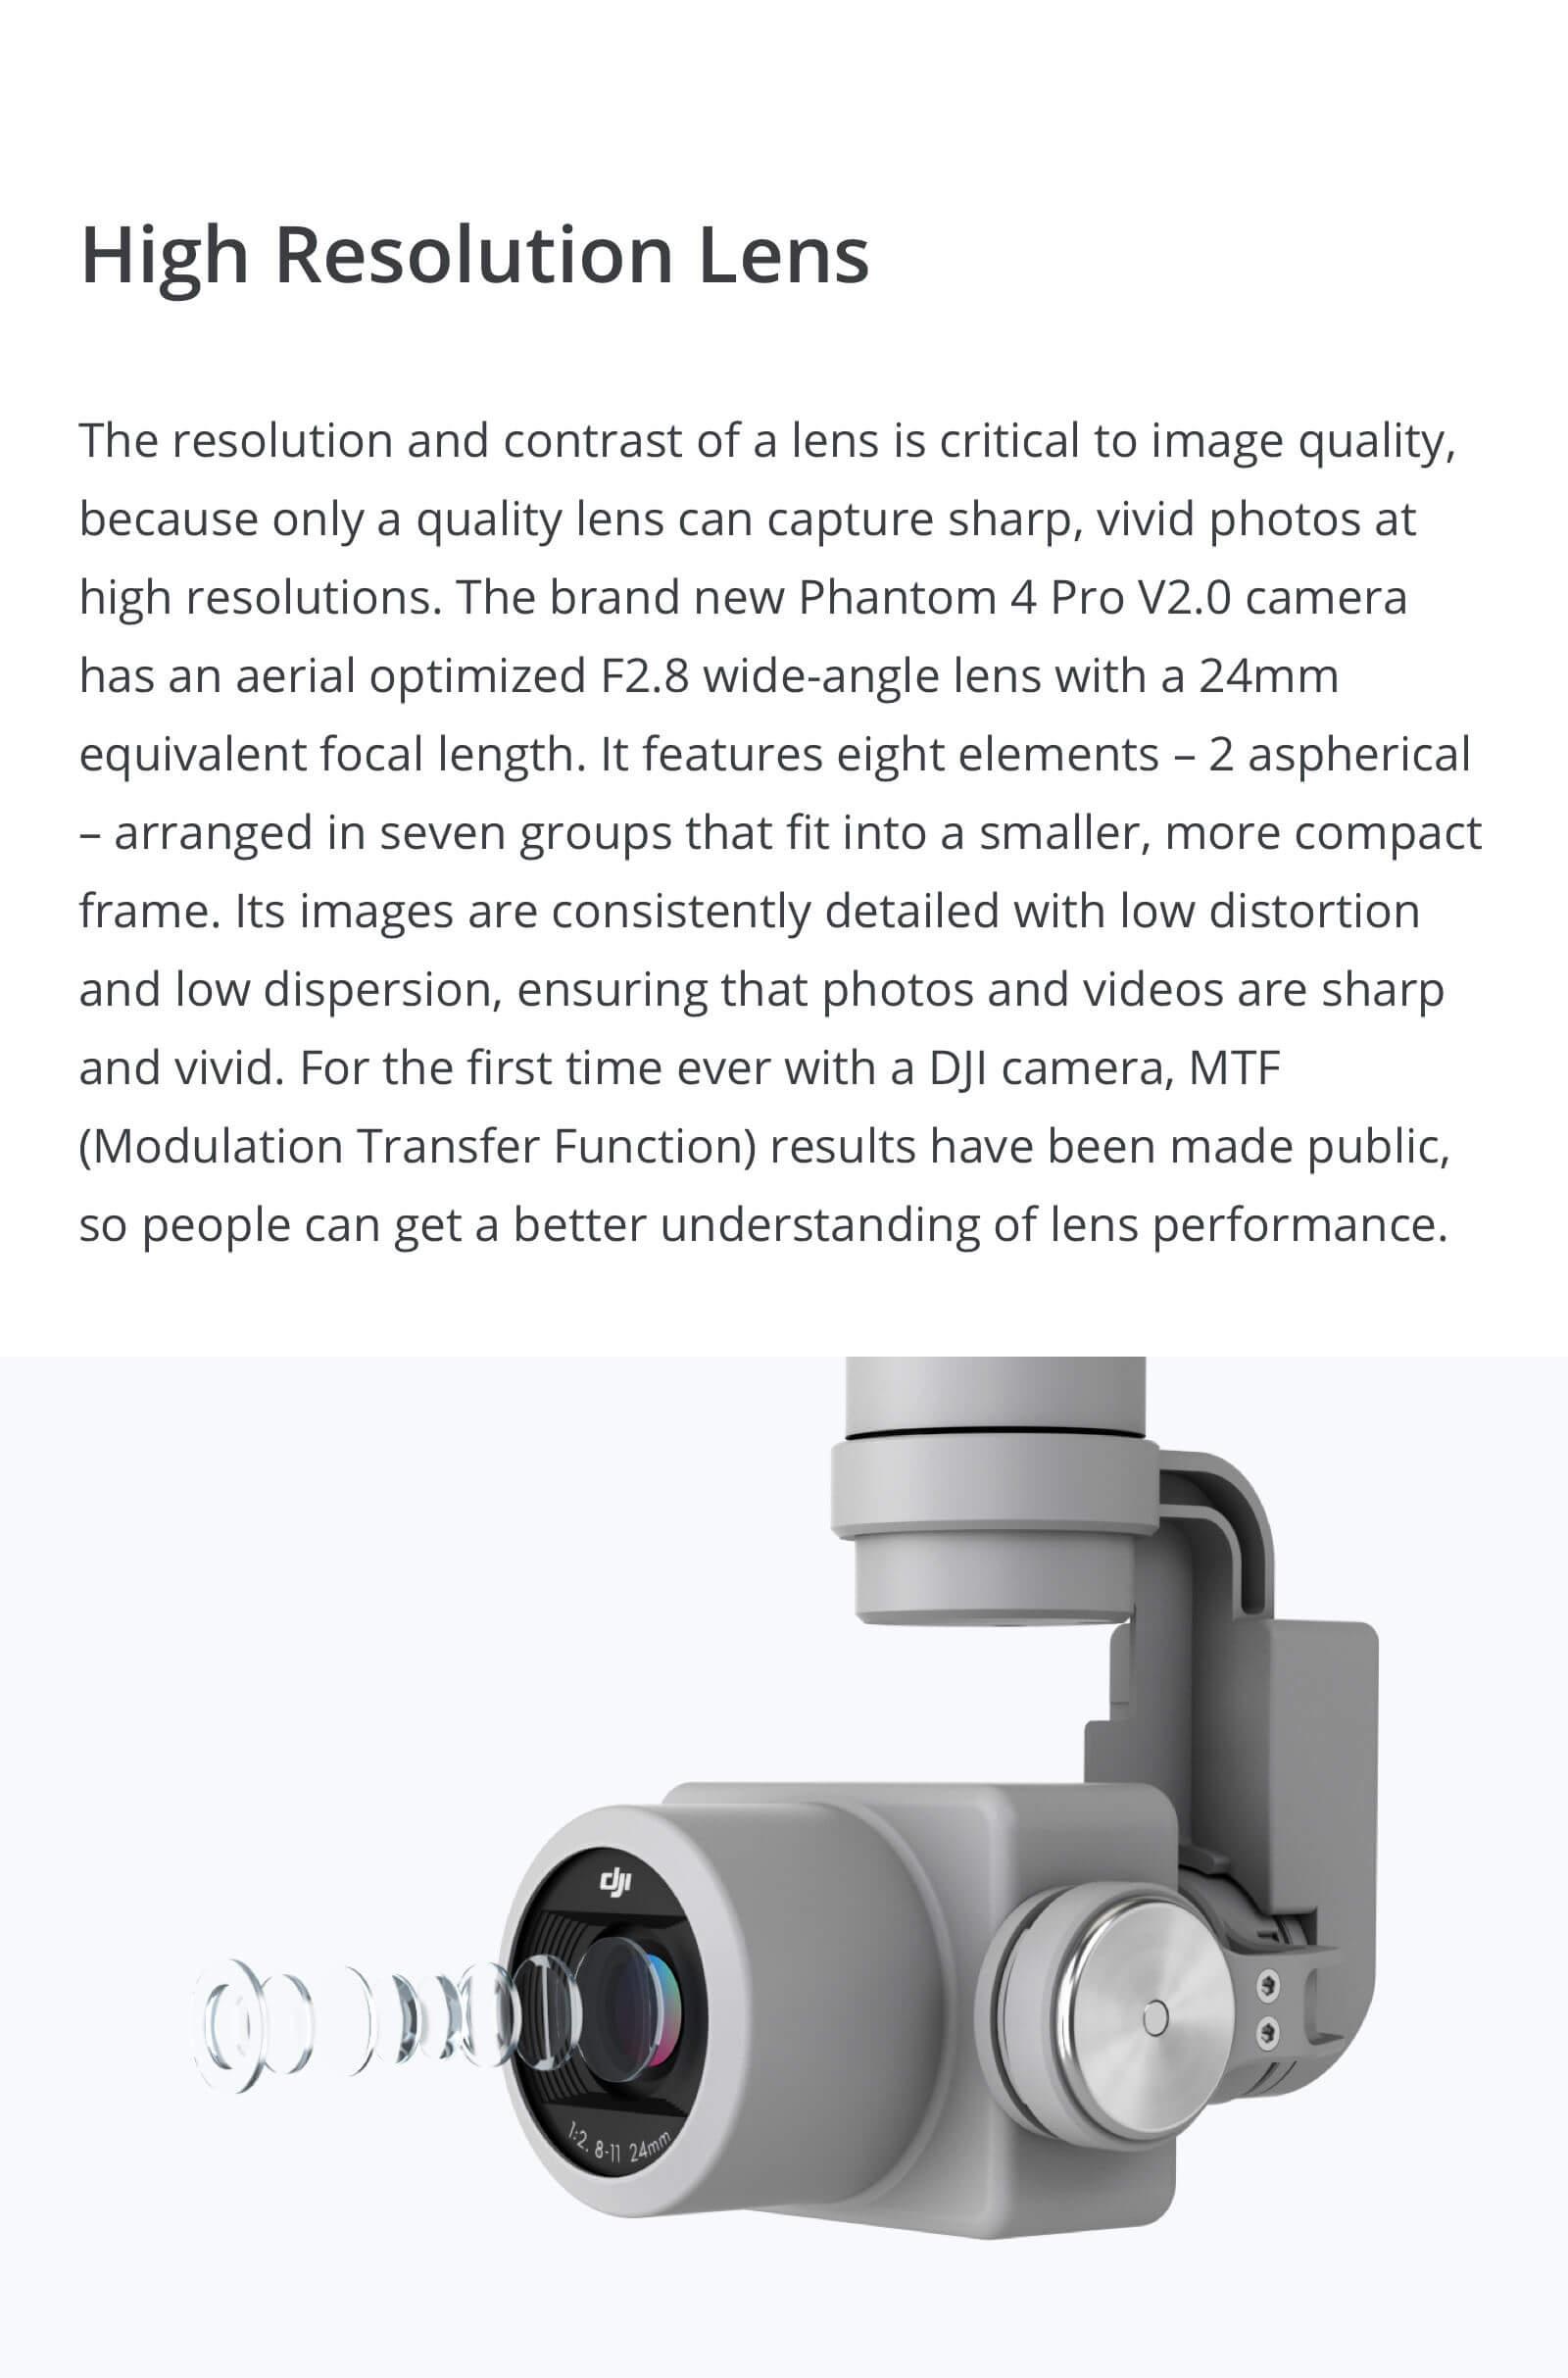 DJI Phantom 4 Pro Camera Lens